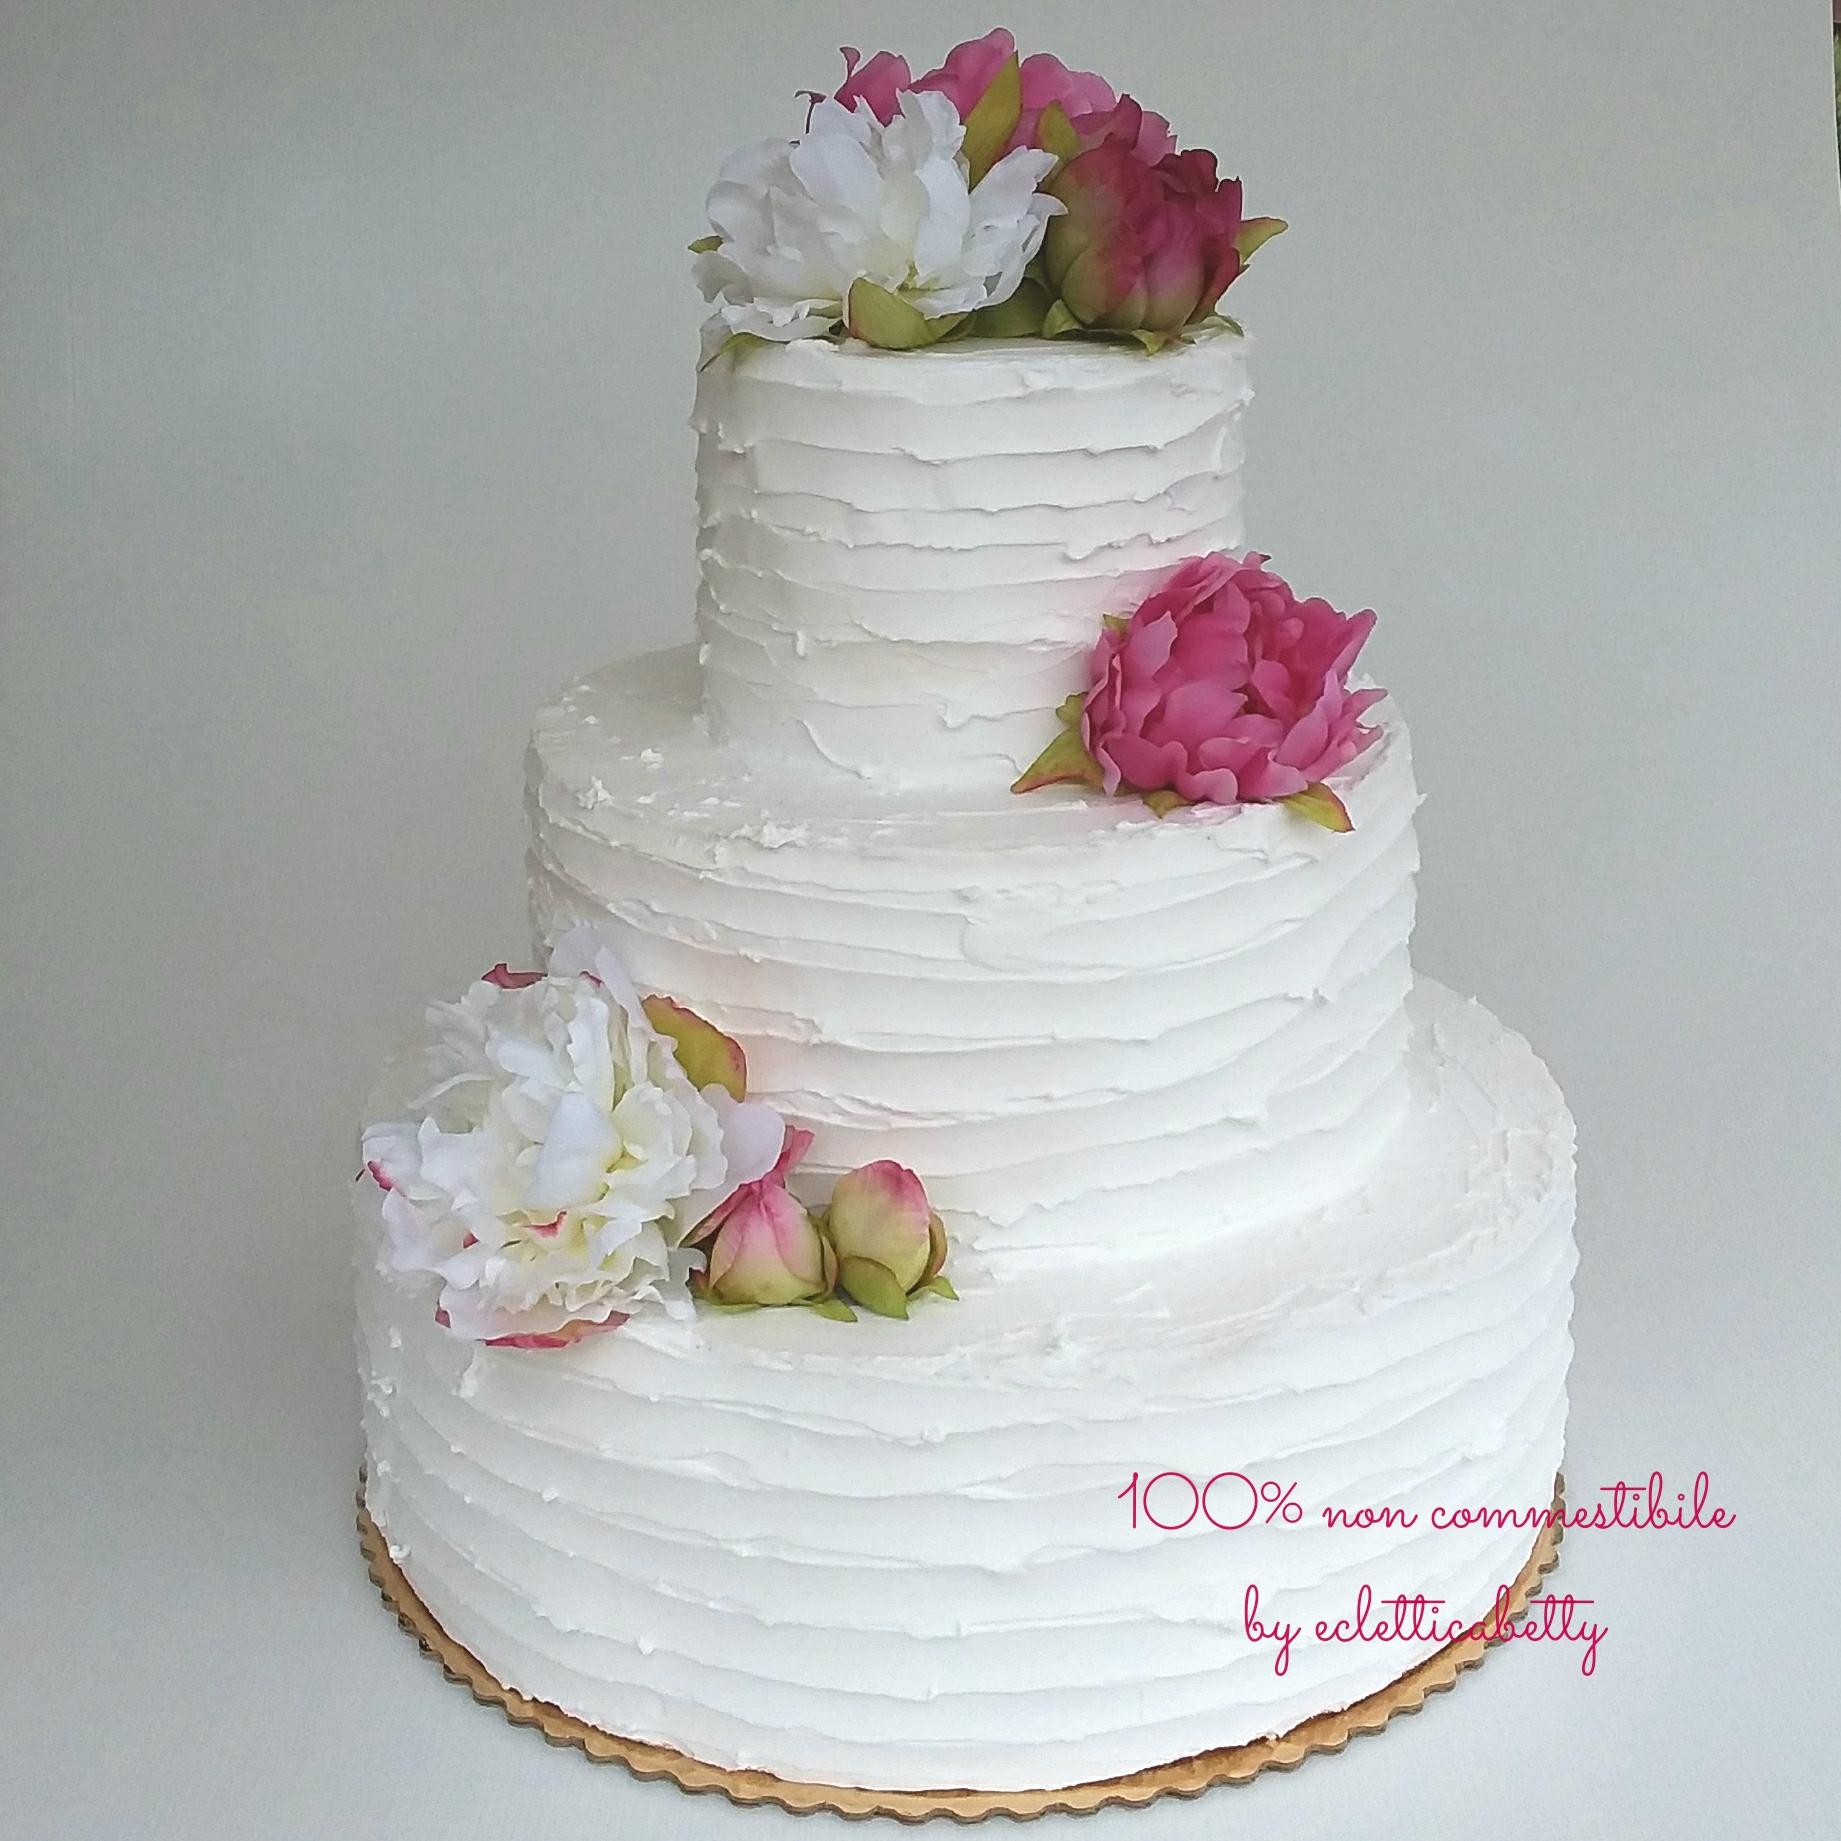 Toutjour Wedding Cake Bianca Con Fiori Ecletticabetty